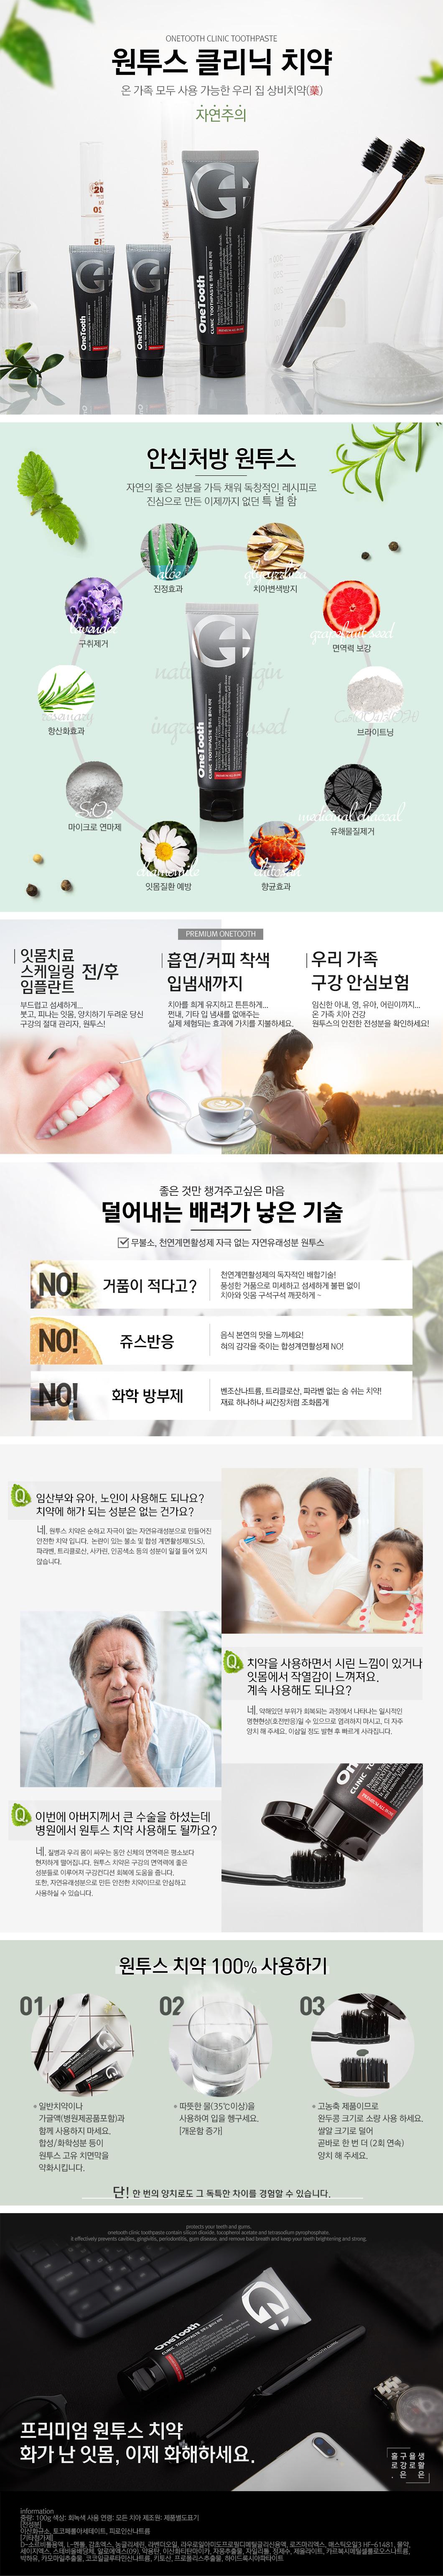 onetooth_toothpaste.jpg